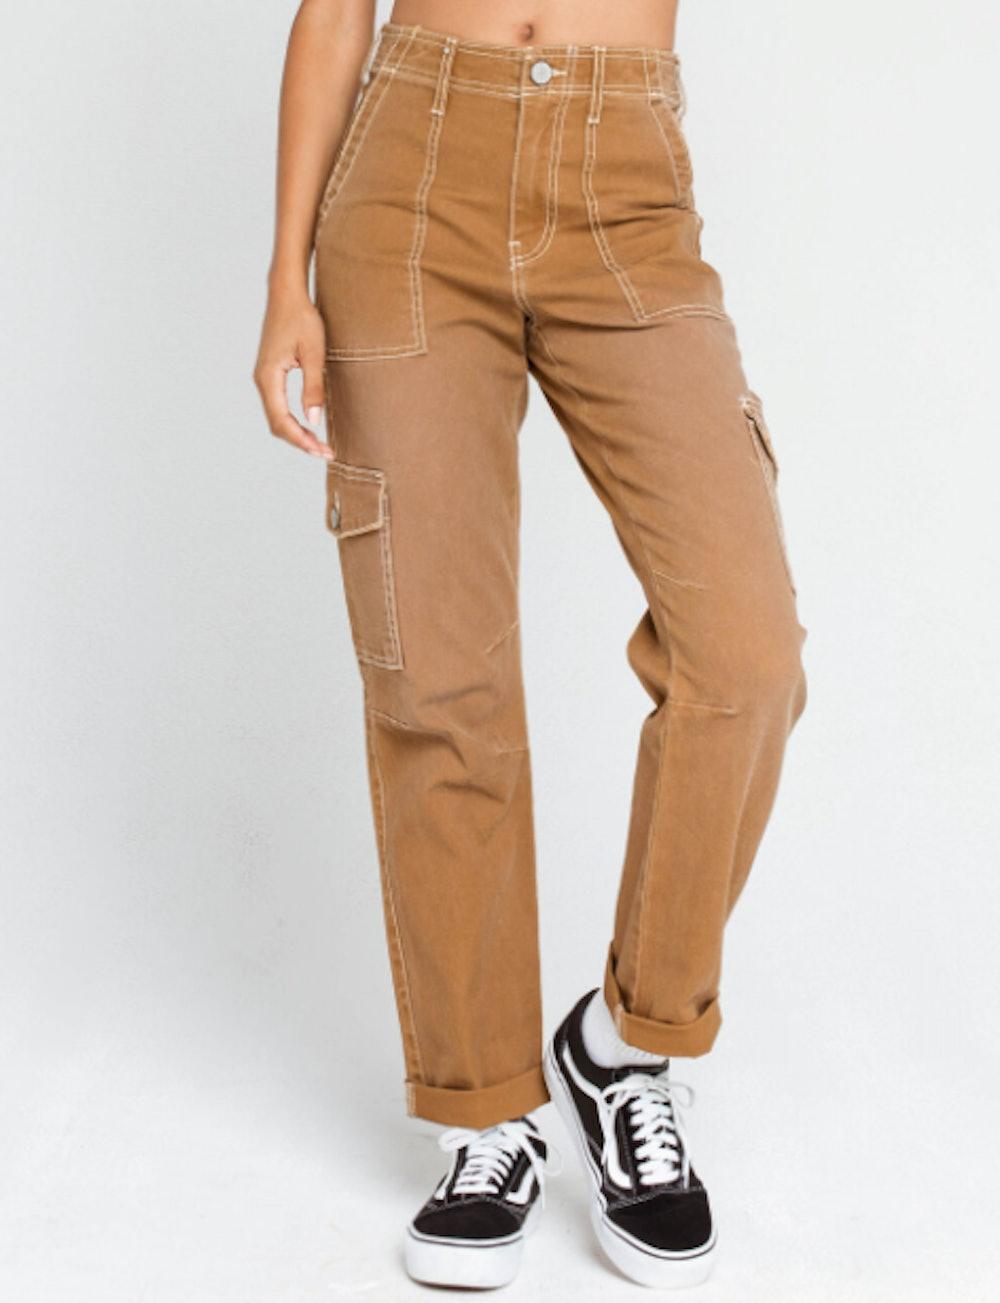 Roll Cuff Womens Cargo Pants